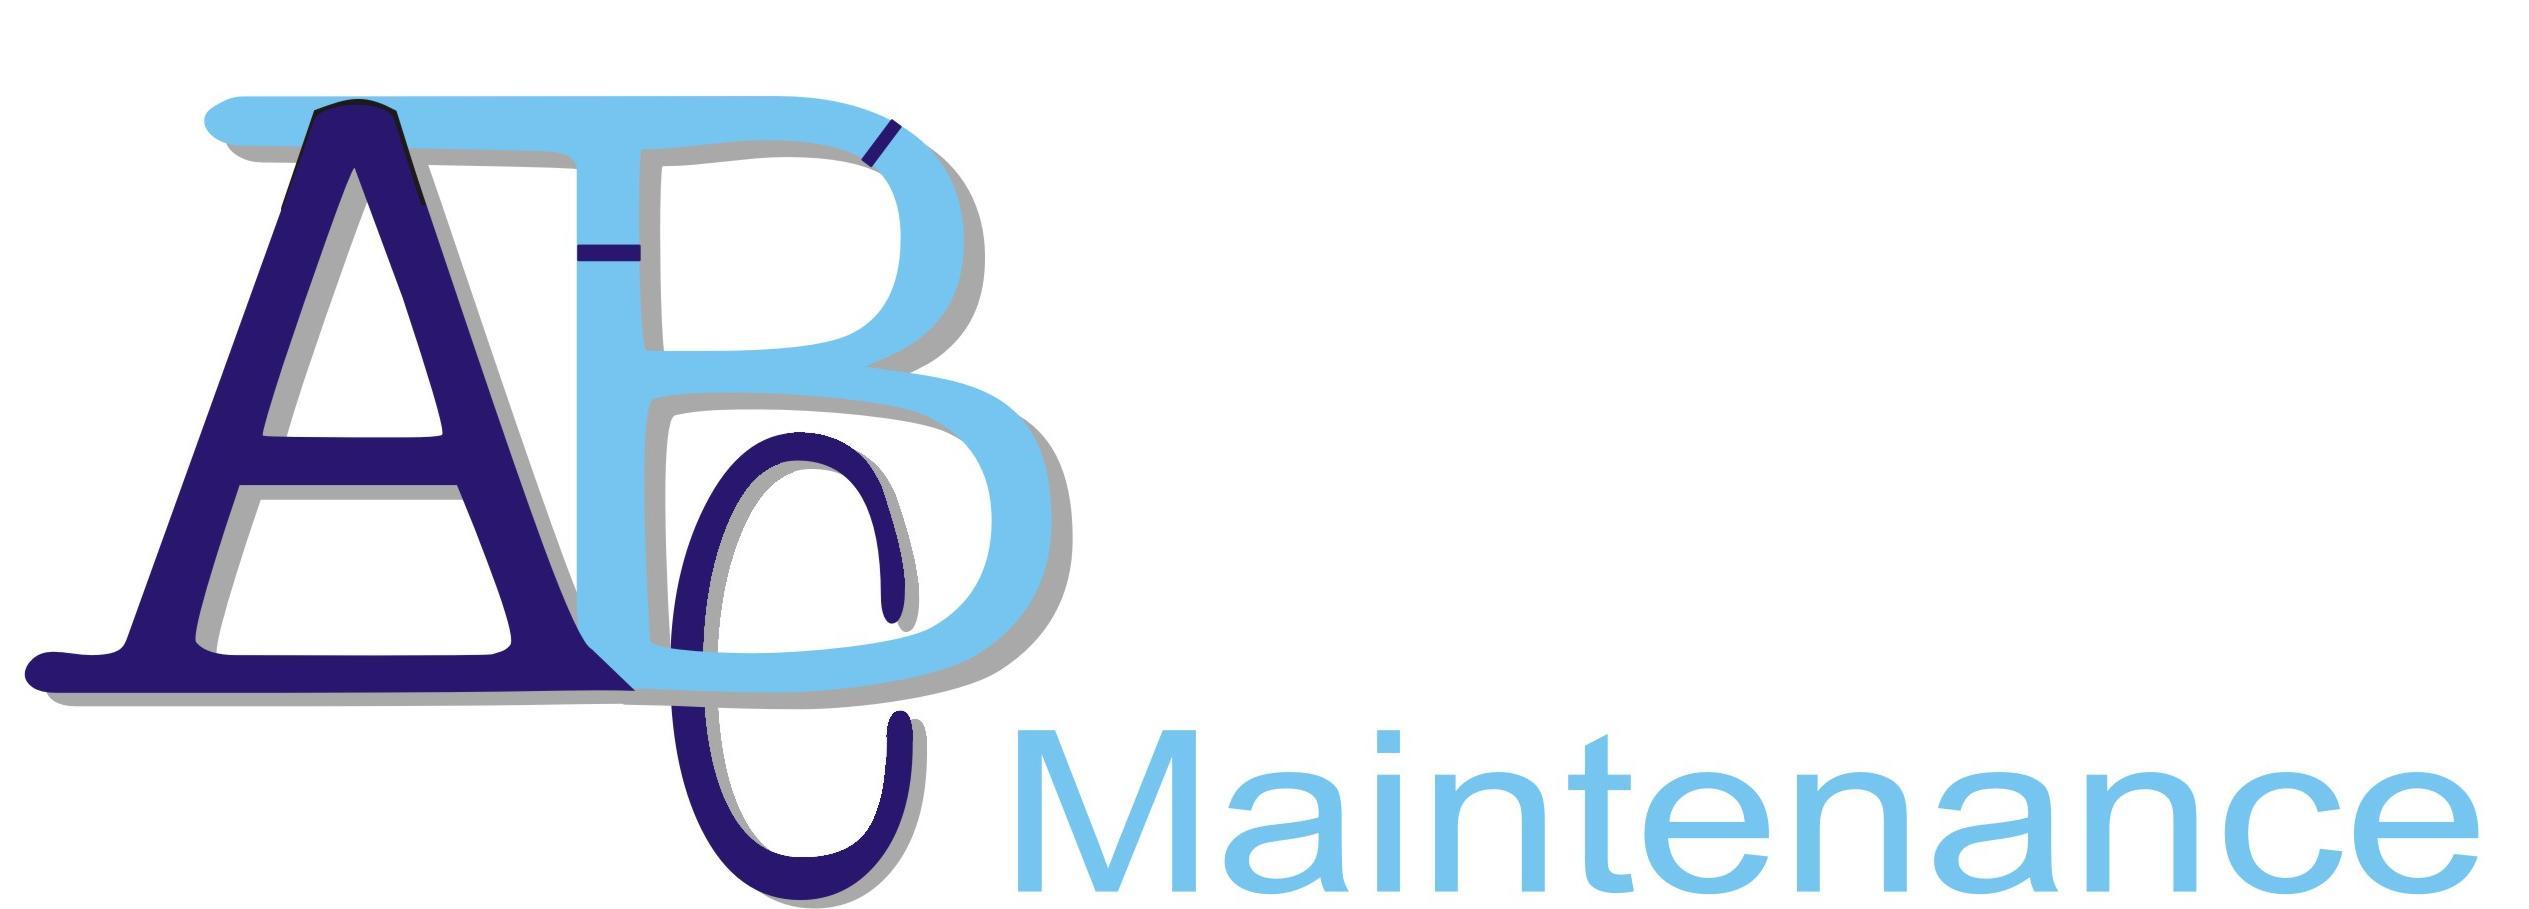 ABC maintenance